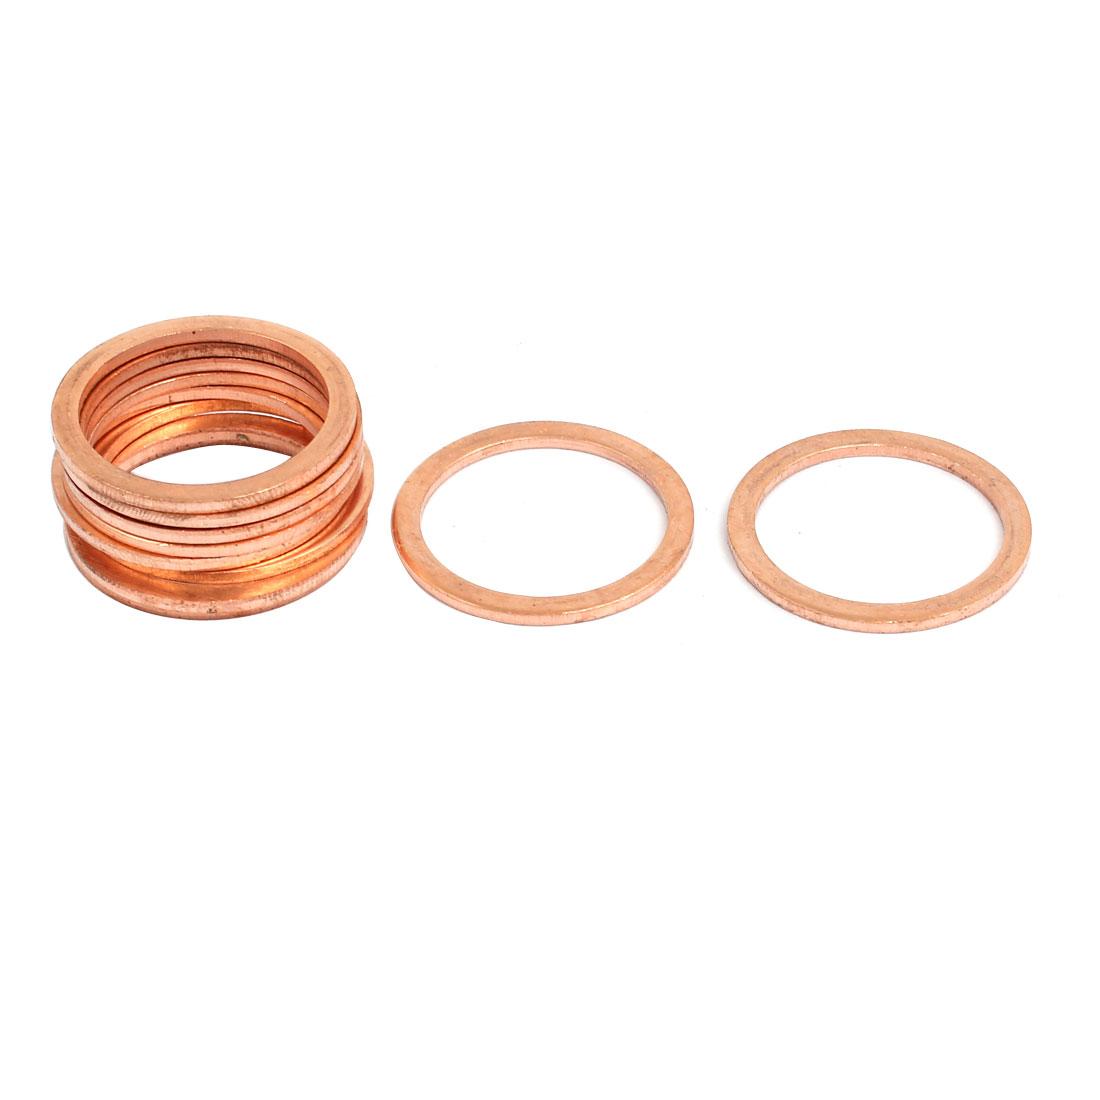 10pcs 22mmx27mmx1.5mm Copper Flat Ring Sealing Crush Washer Gasket